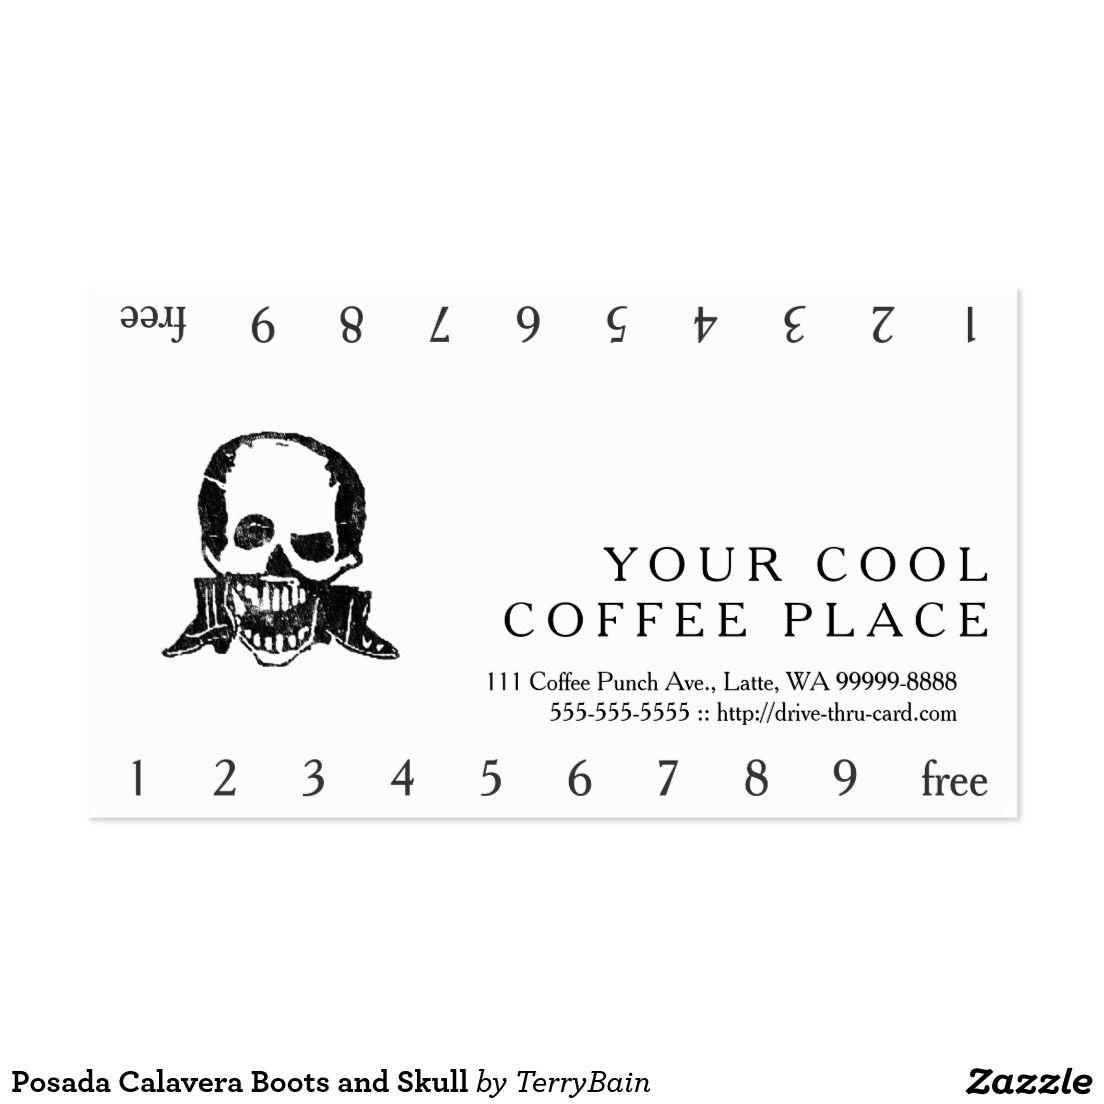 Posada calavera boots and skull business card magicingreecefo Choice Image